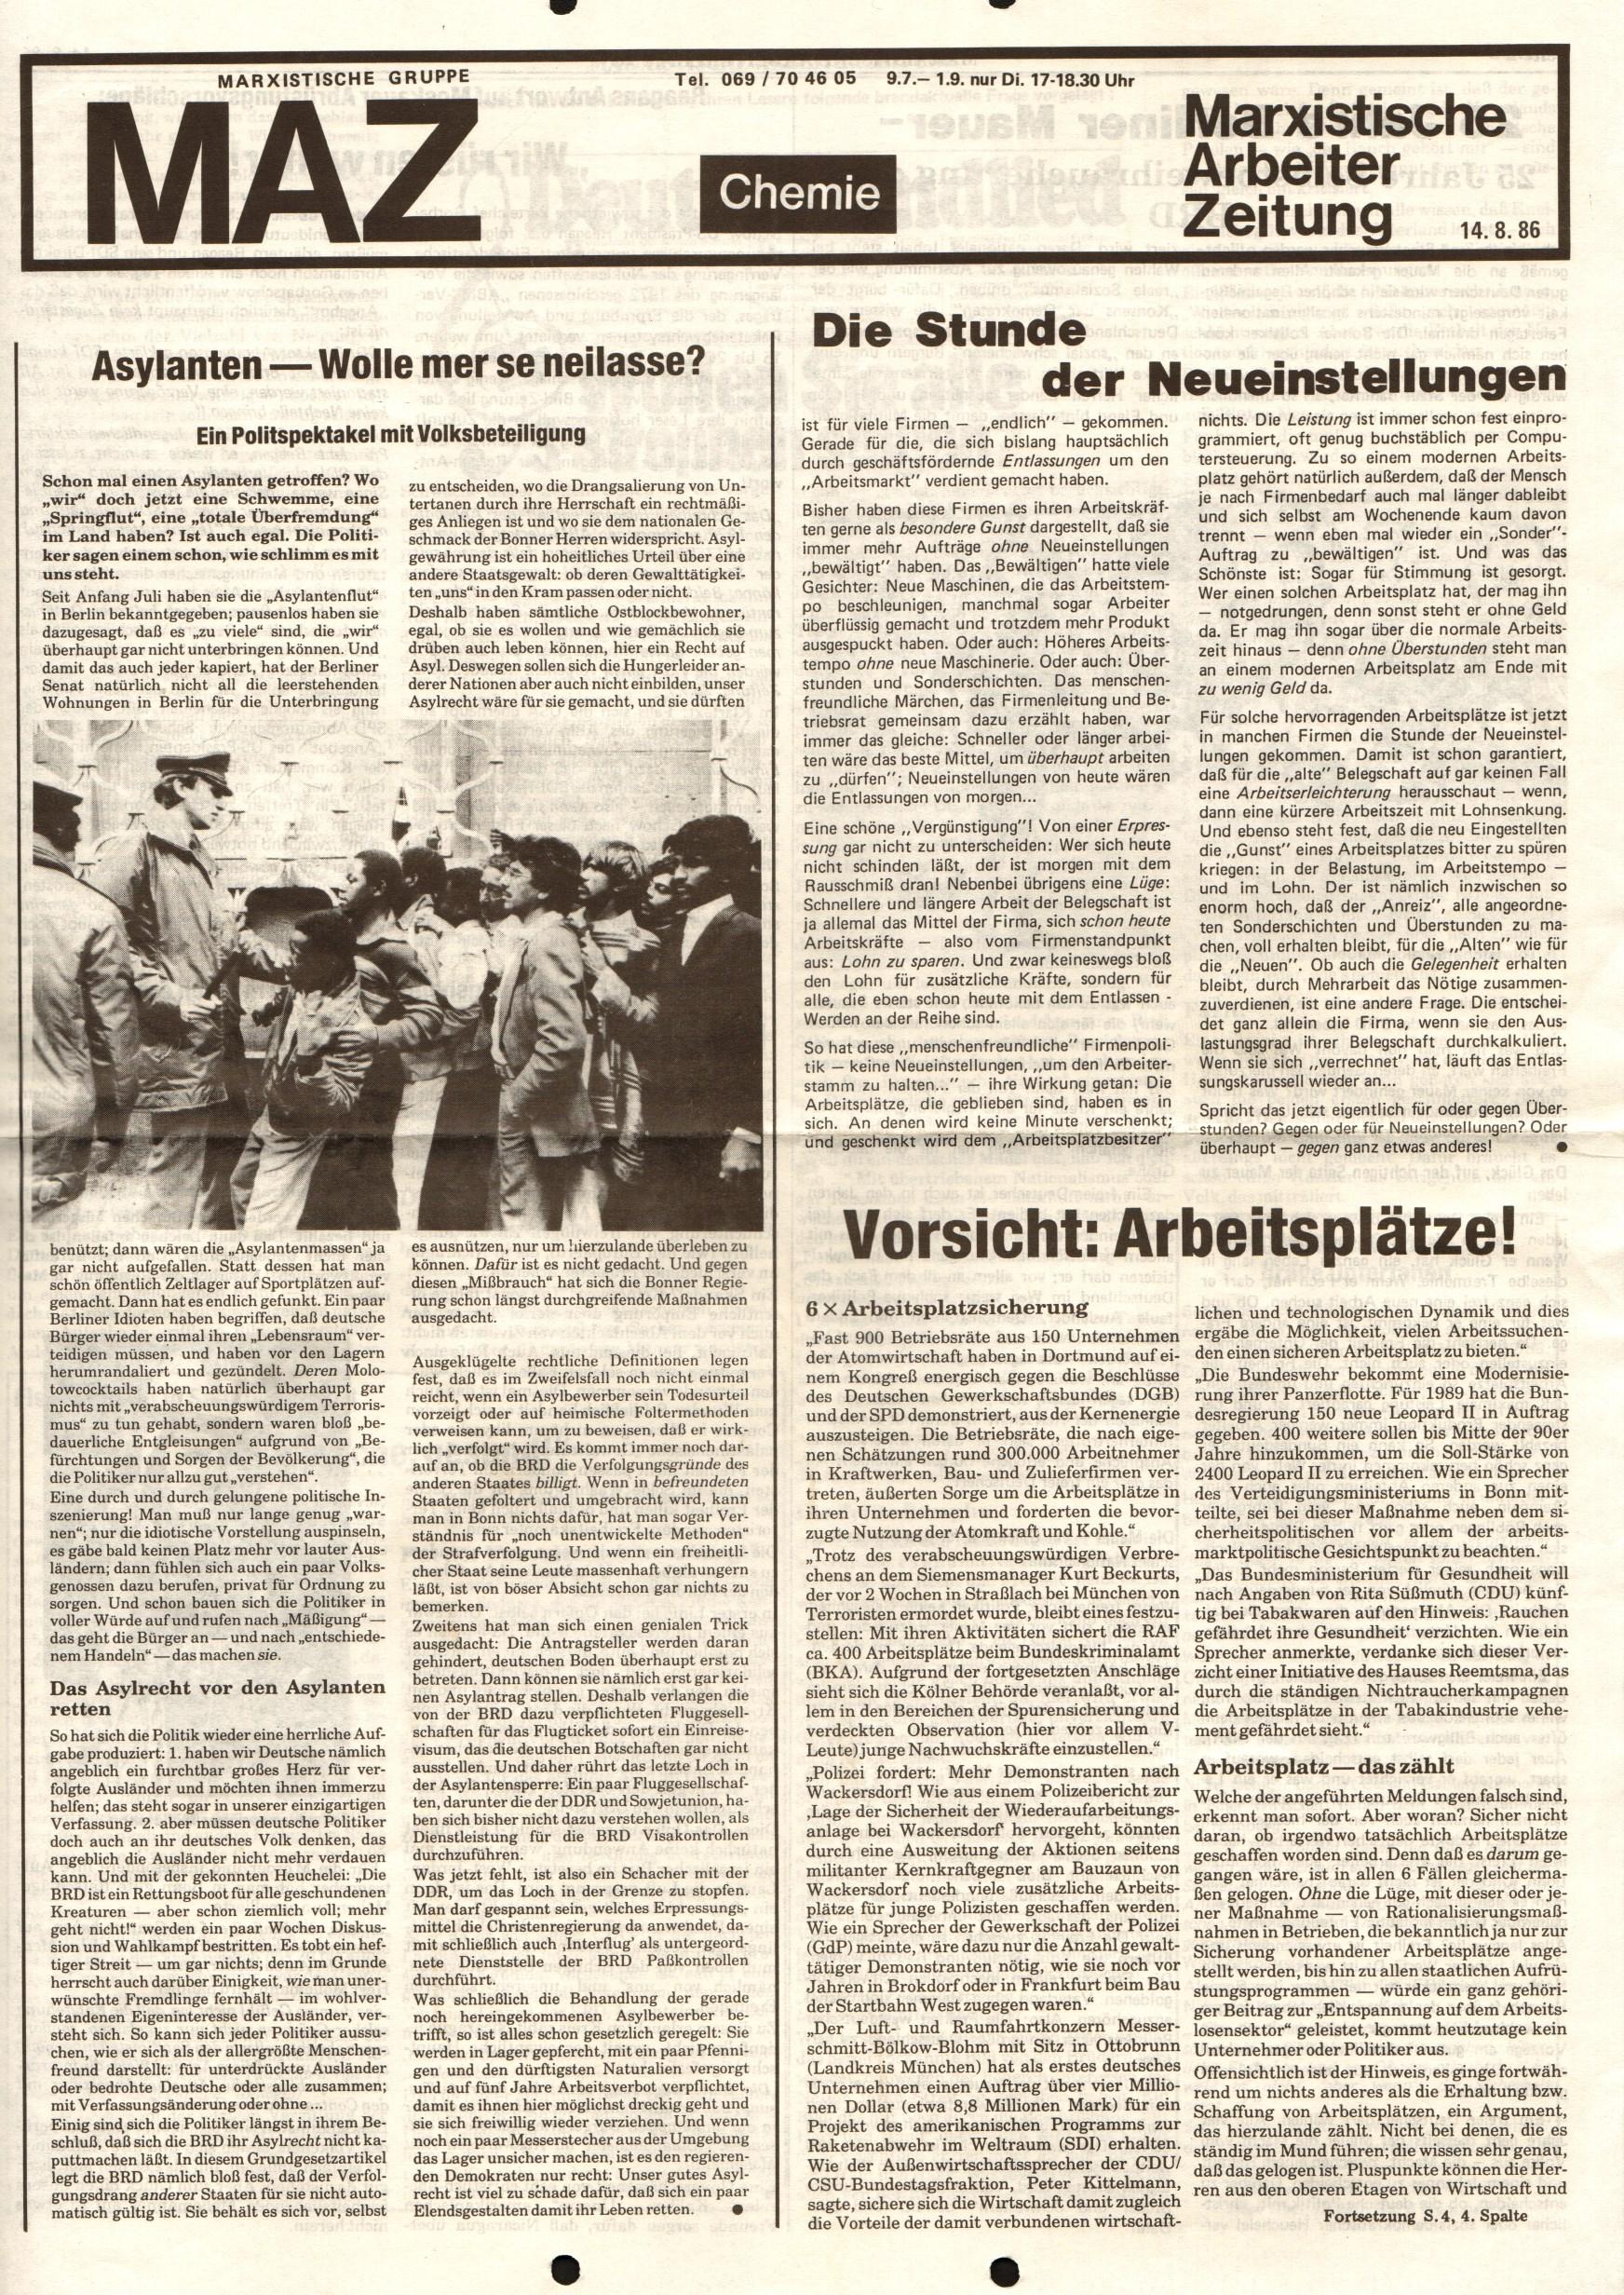 Frankfurt_CPK_Hoechst_MAZ389